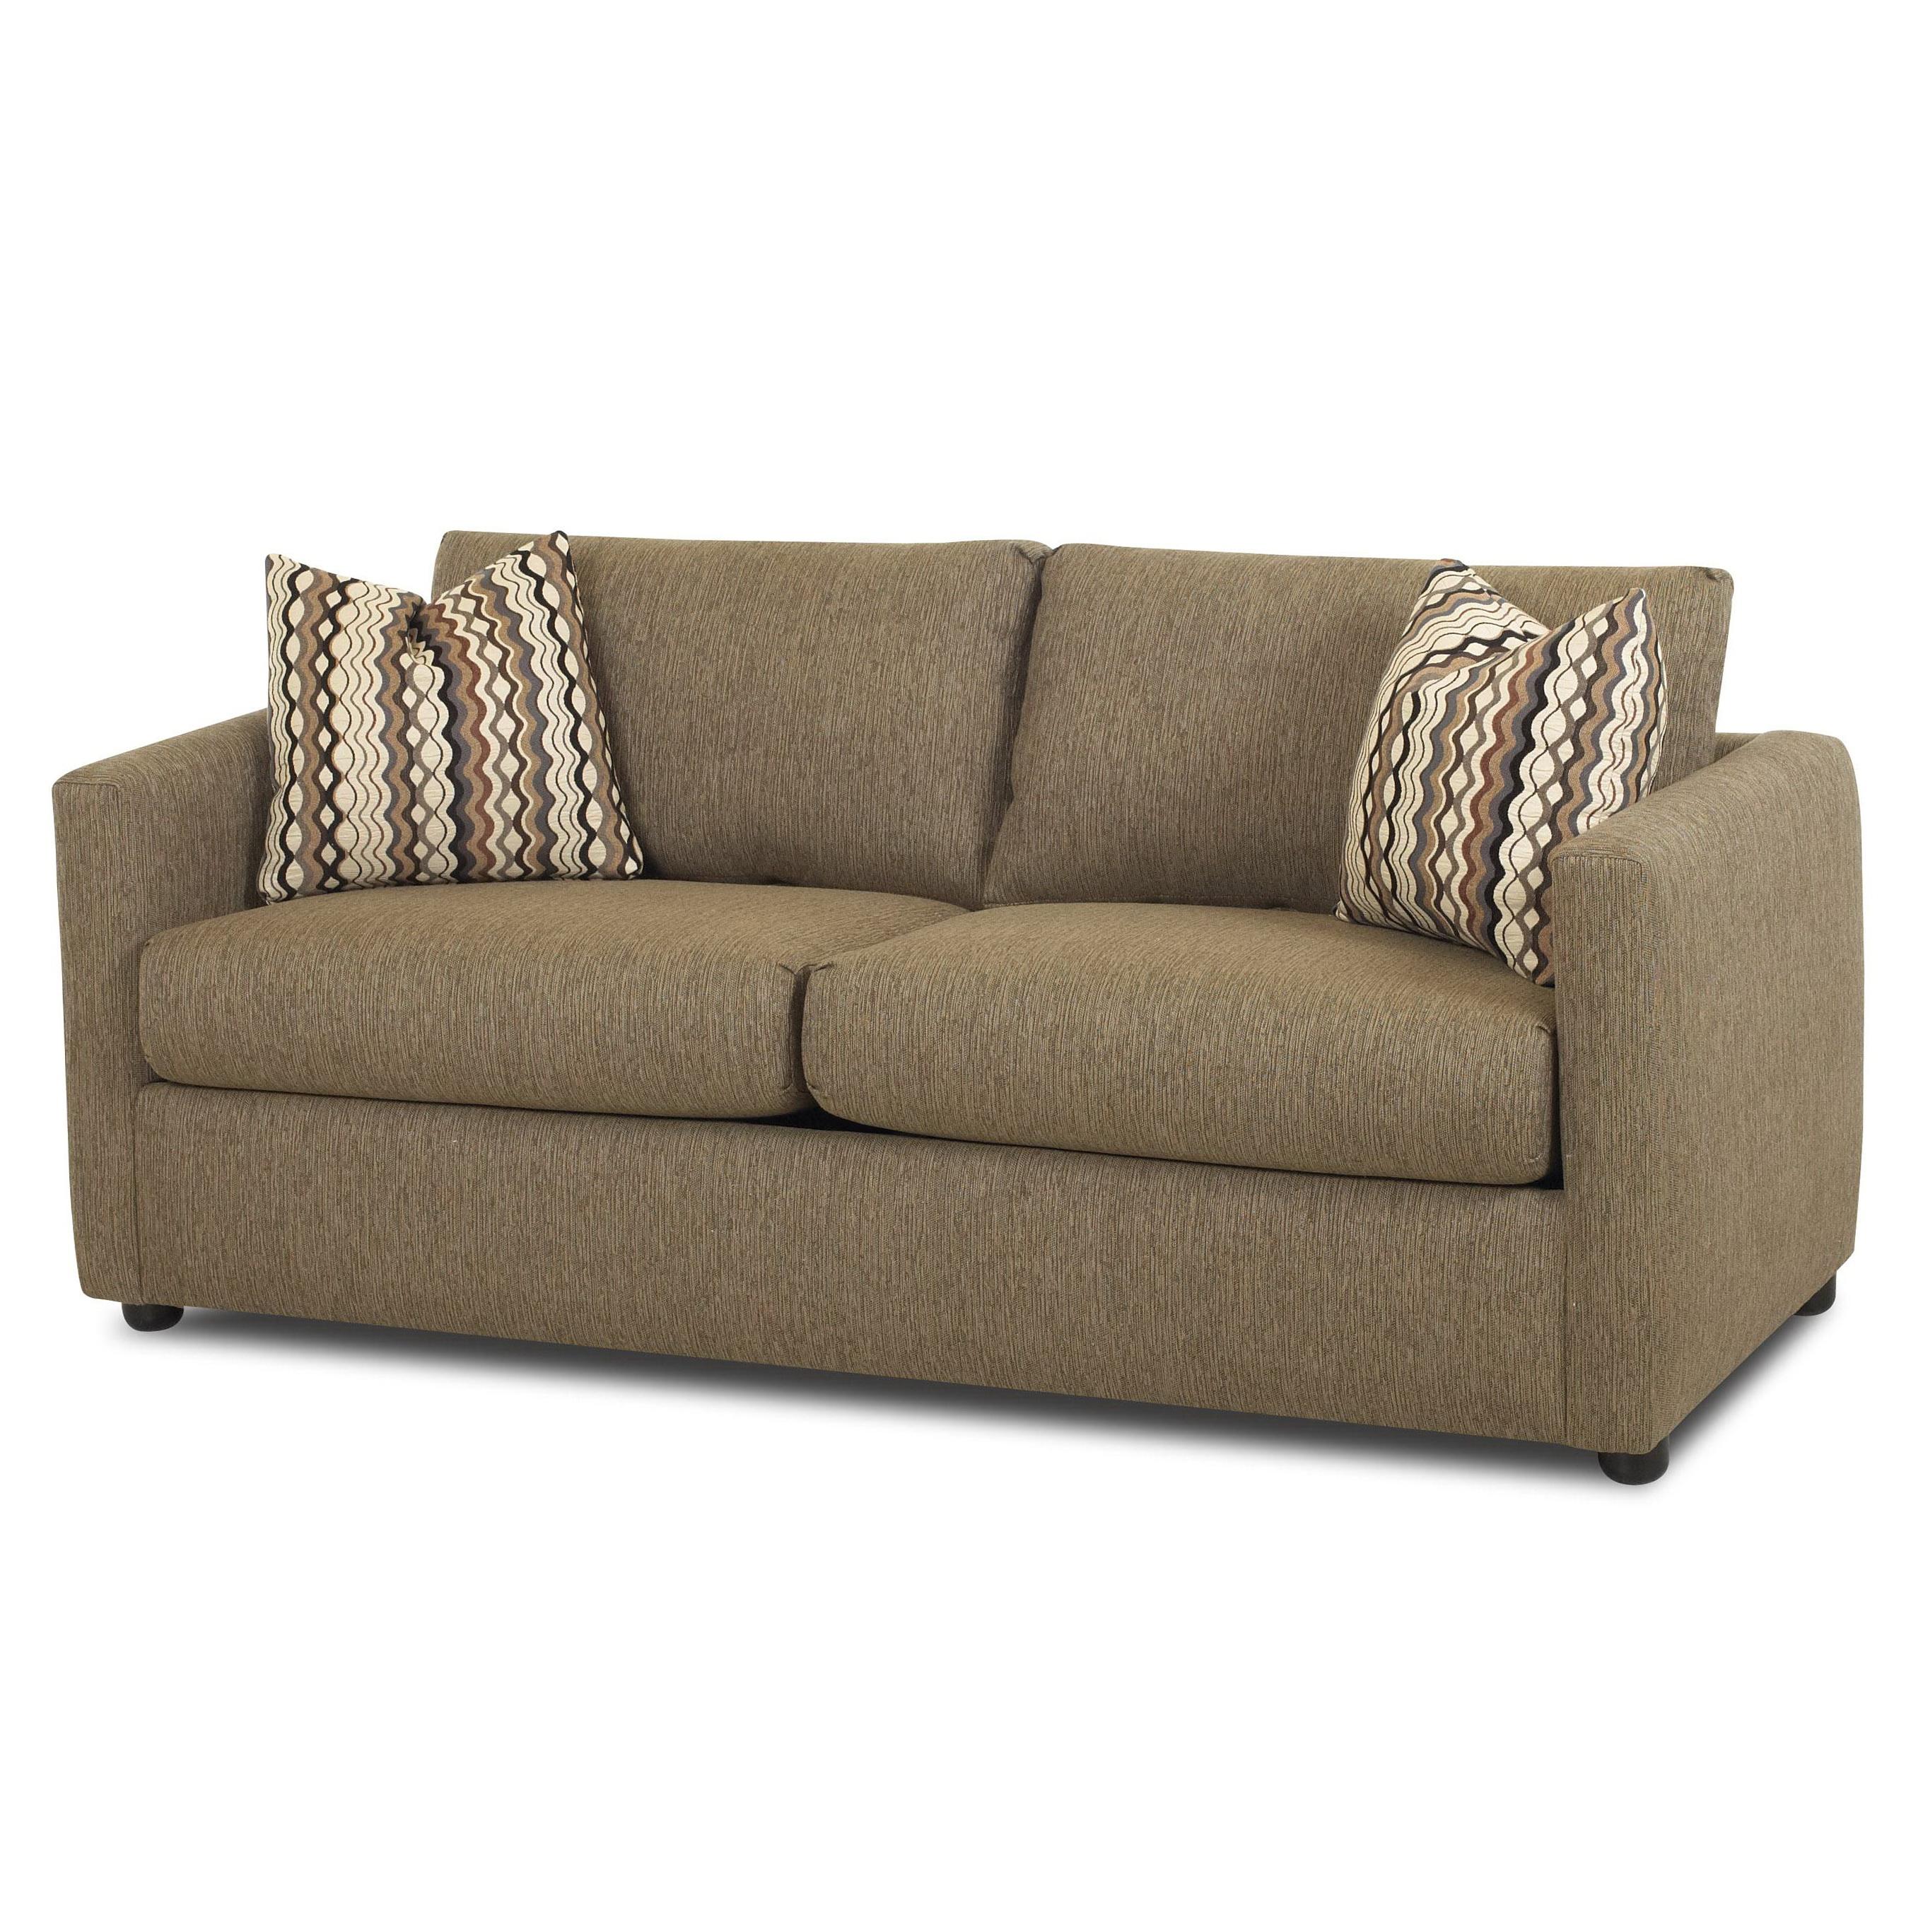 Sleeper Sofa Mattress Sizes